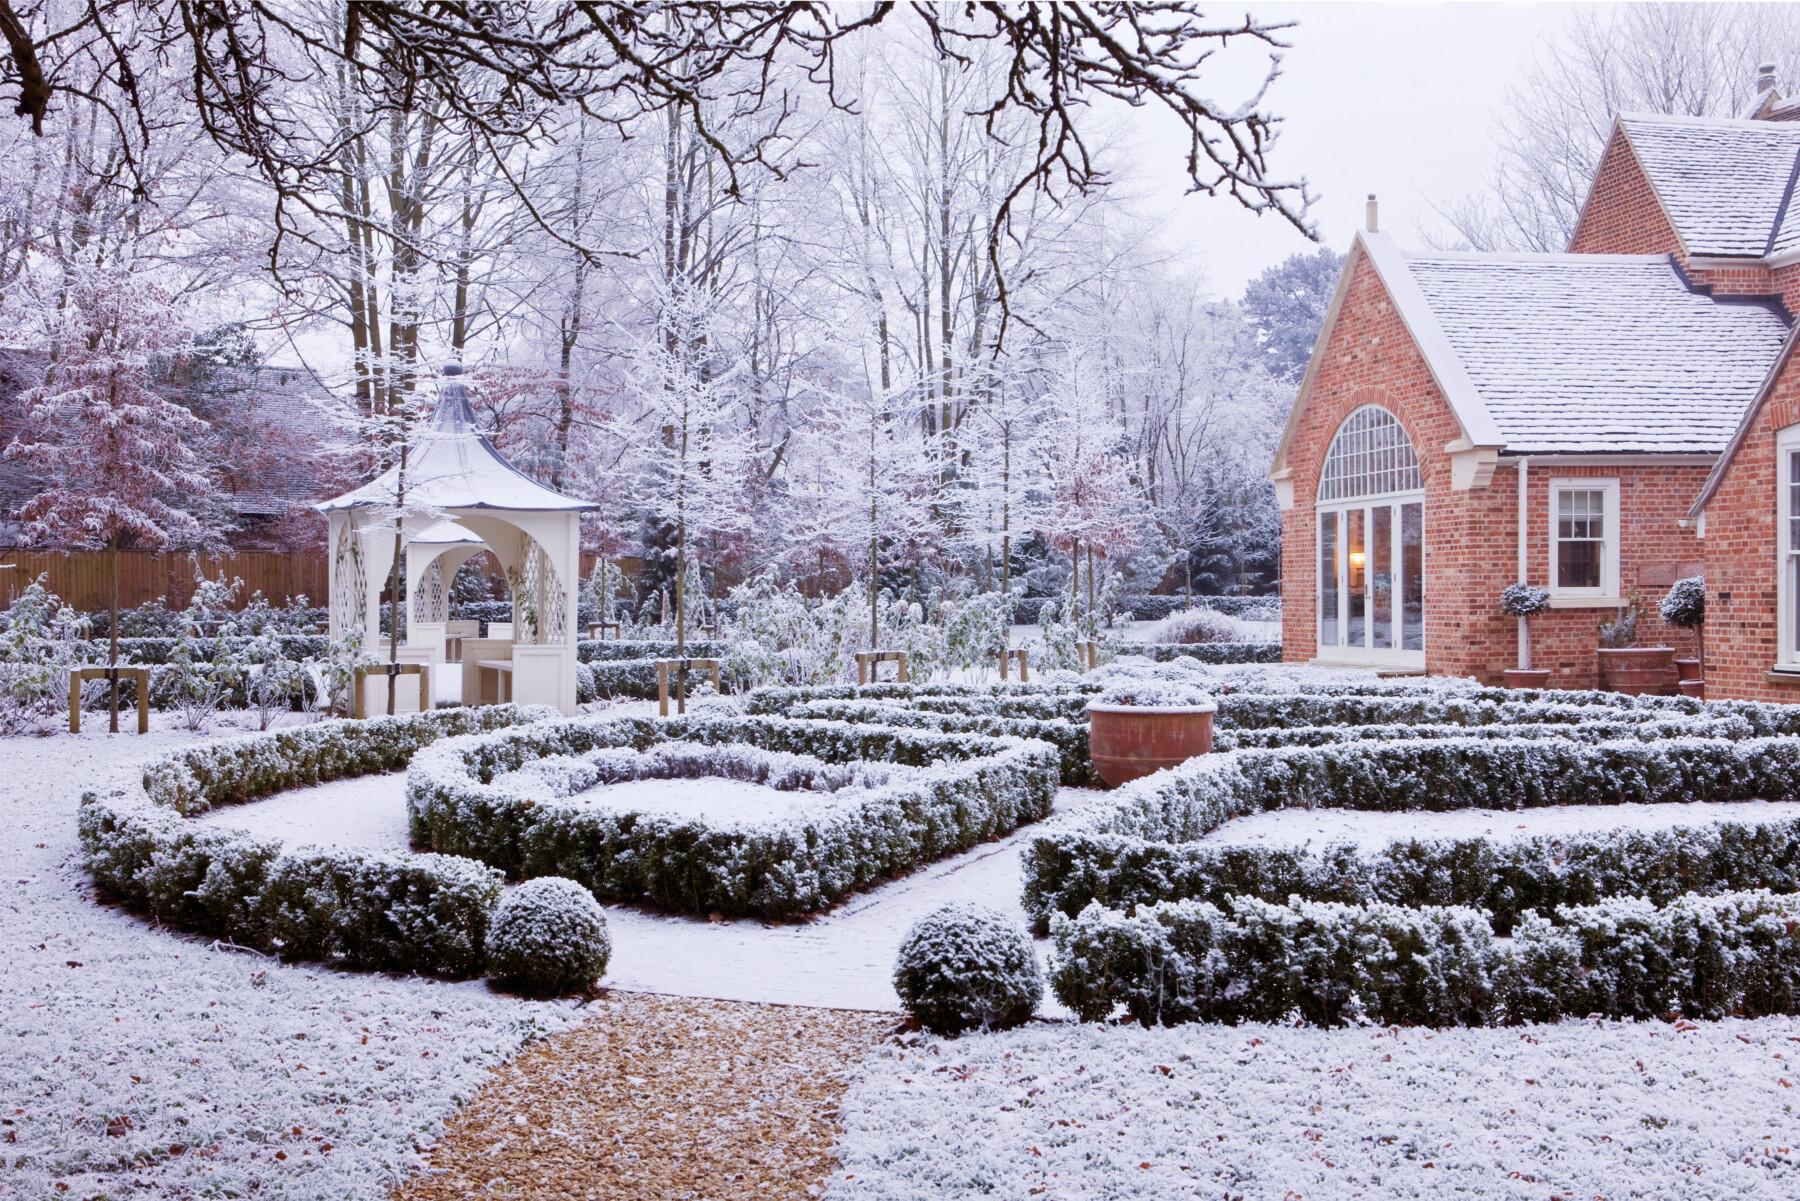 Gardening Life in Winter